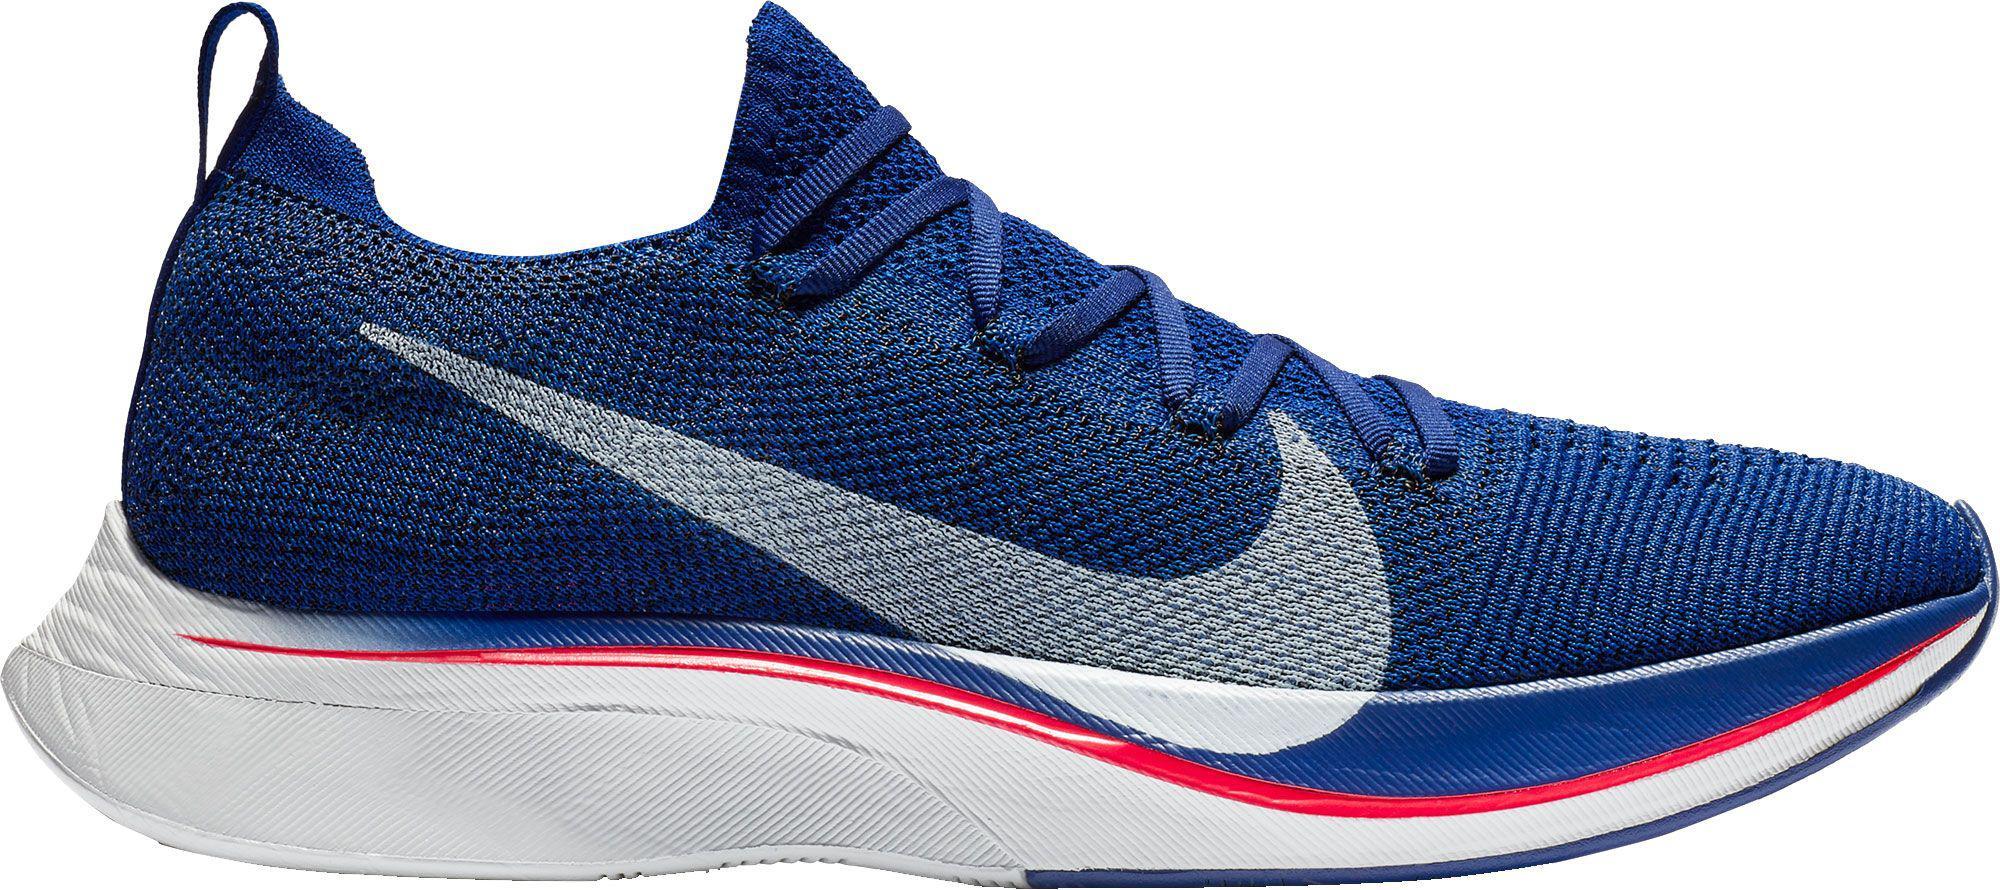 d71086c3447e Lyst - Nike Vaporfly 4% Flyknit Running Shoes in Blue for Men